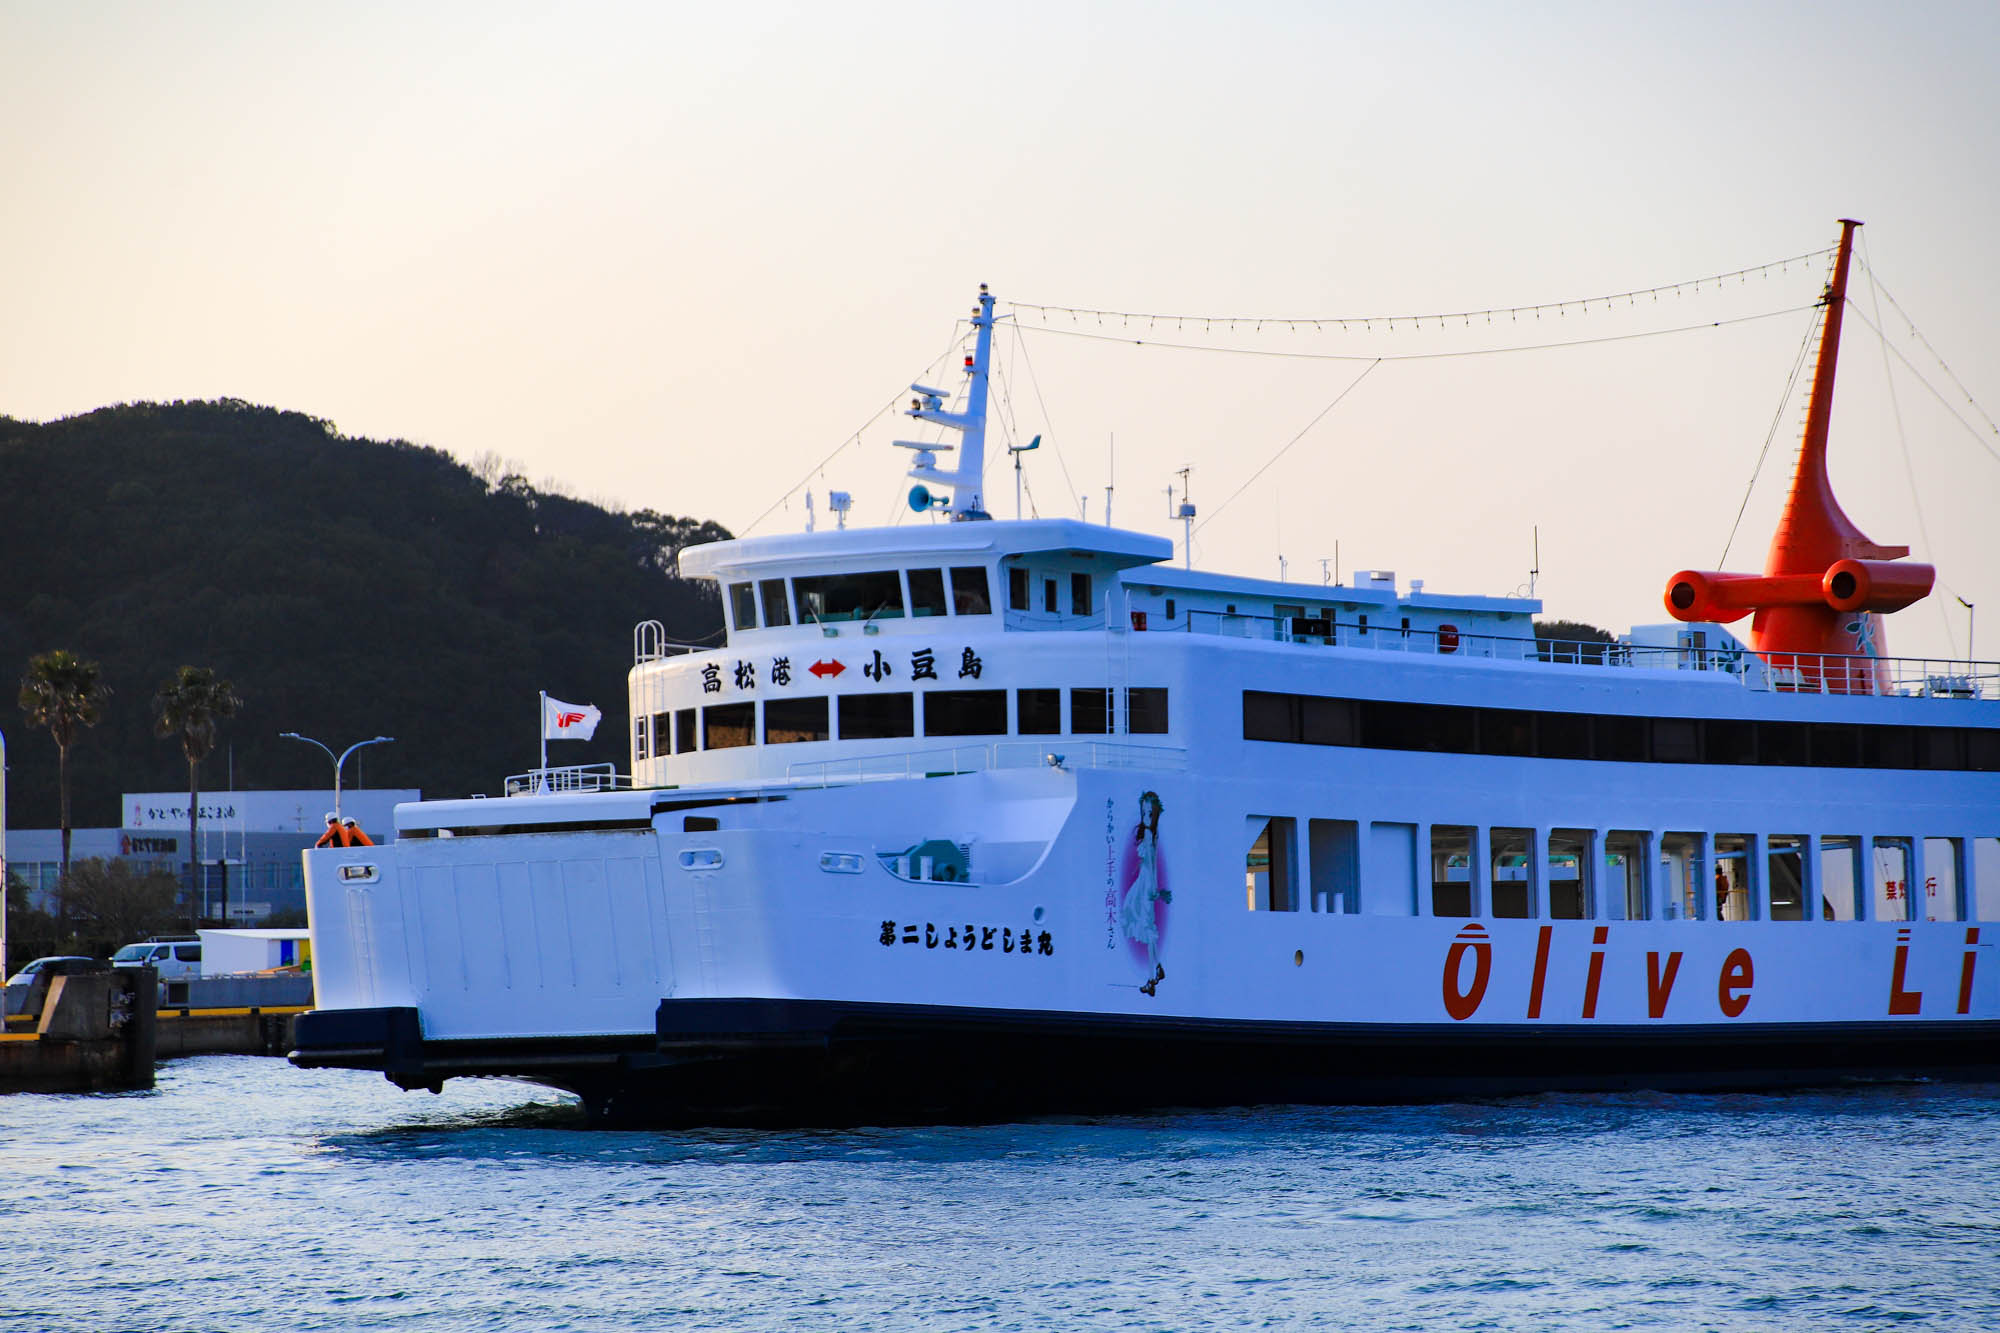 takagisan_ferry-5.jpg